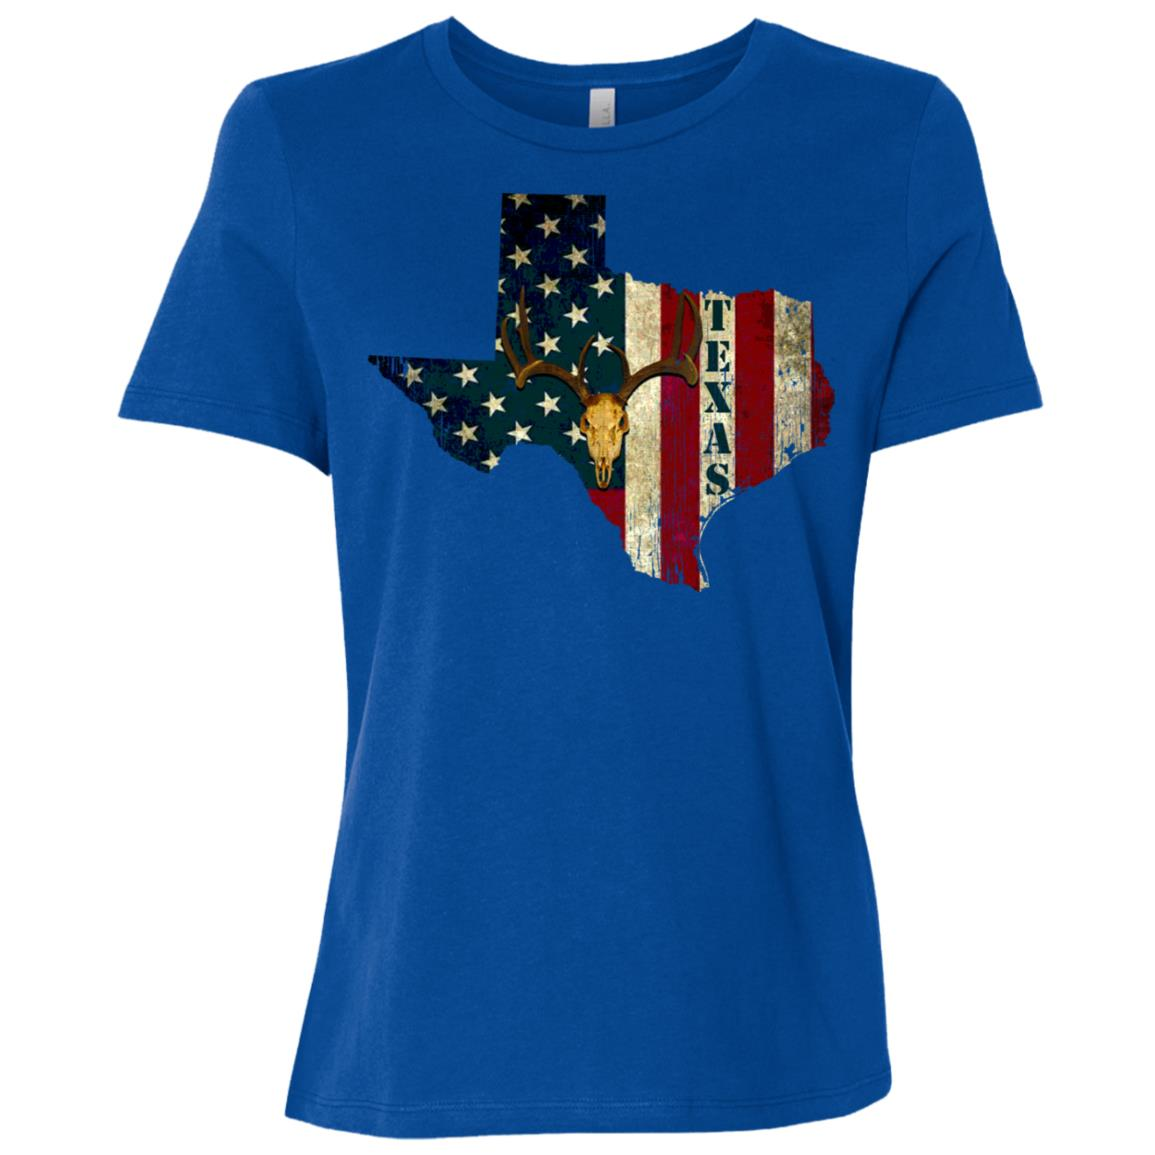 Texas Deer Hunting Usa Flag Gift Men Women Short Sleeve T-Shirt